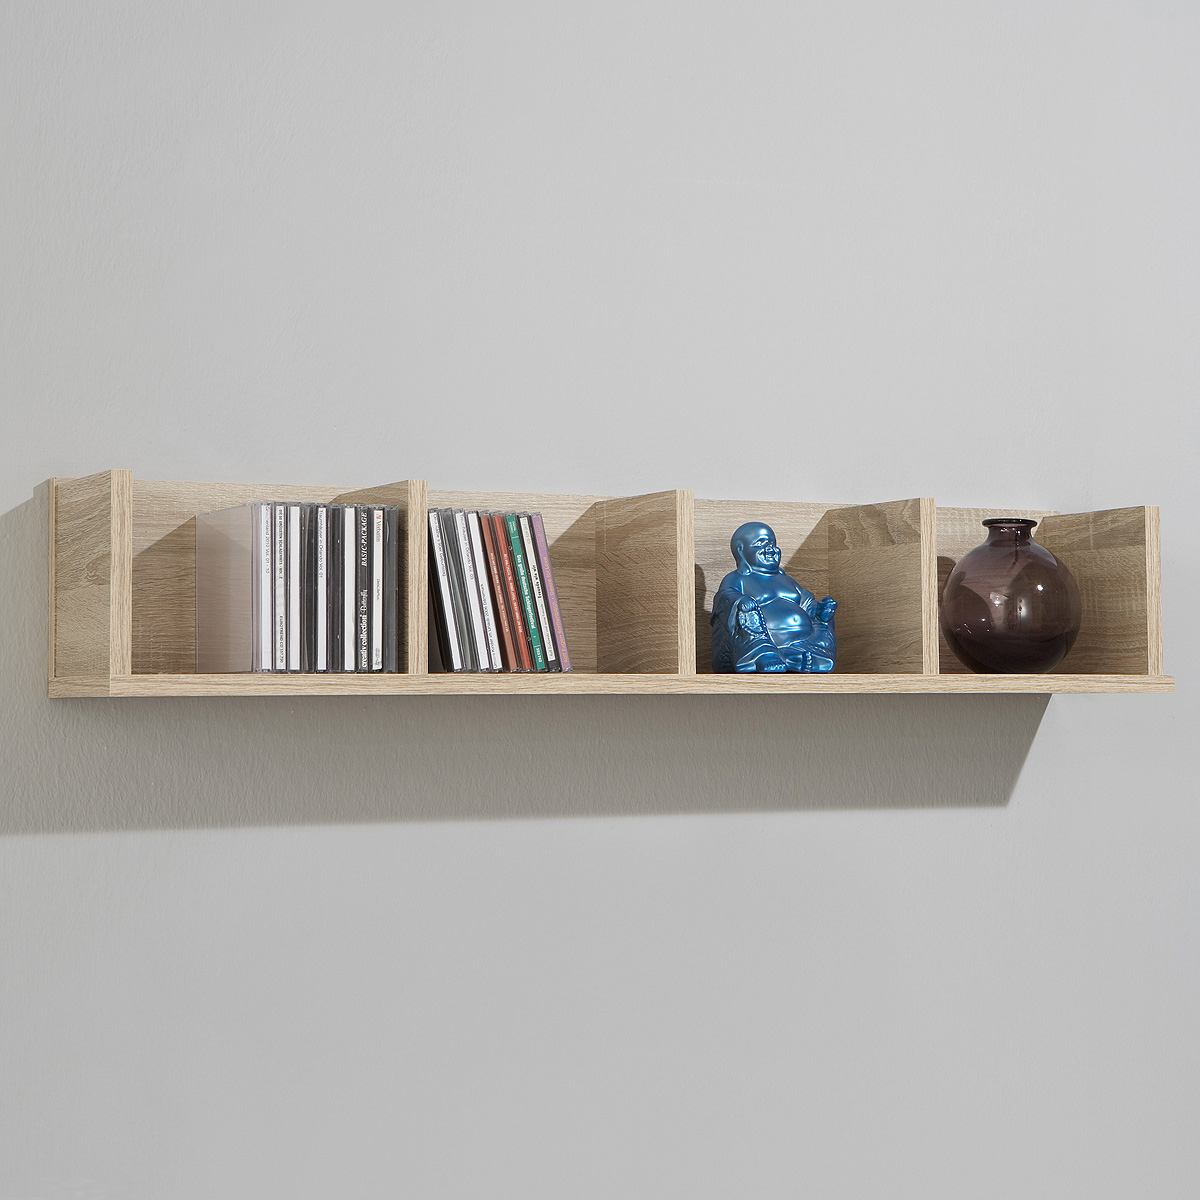 wandregal point 4 cd regal h ngeregal in sonoma eiche ebay. Black Bedroom Furniture Sets. Home Design Ideas